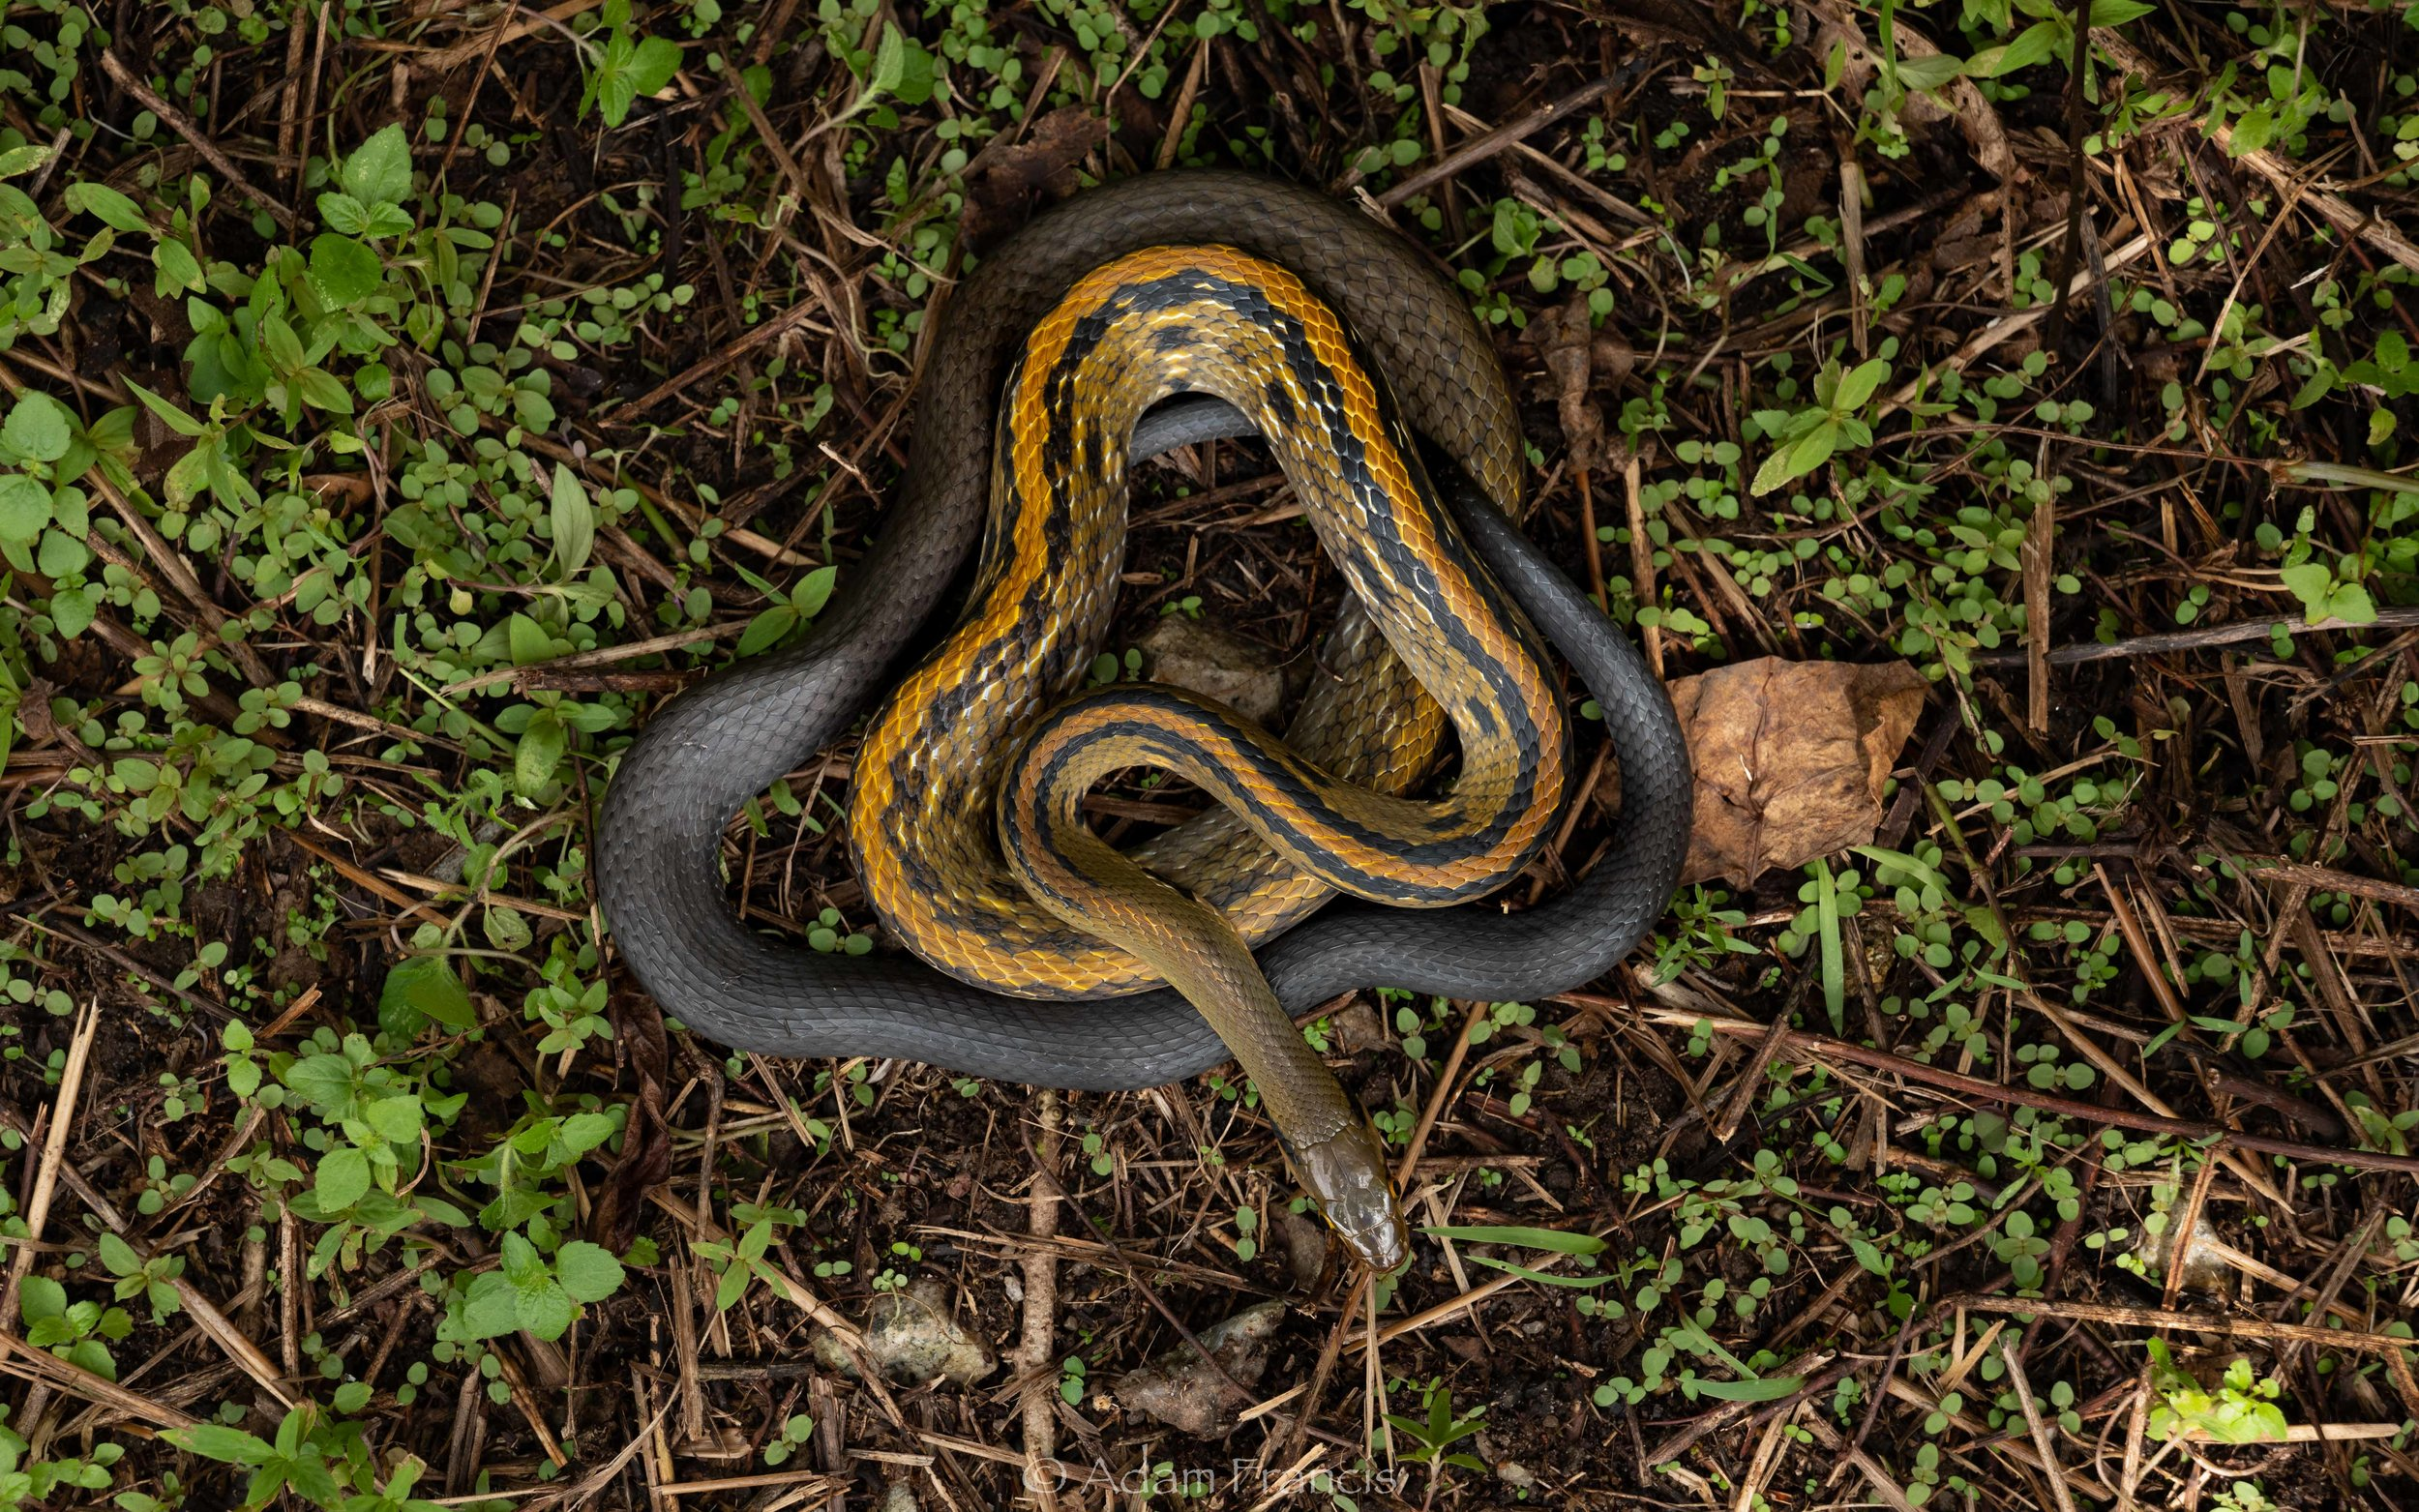 Yellow Striped Trinket Snake - Coelognathus flavolineatus